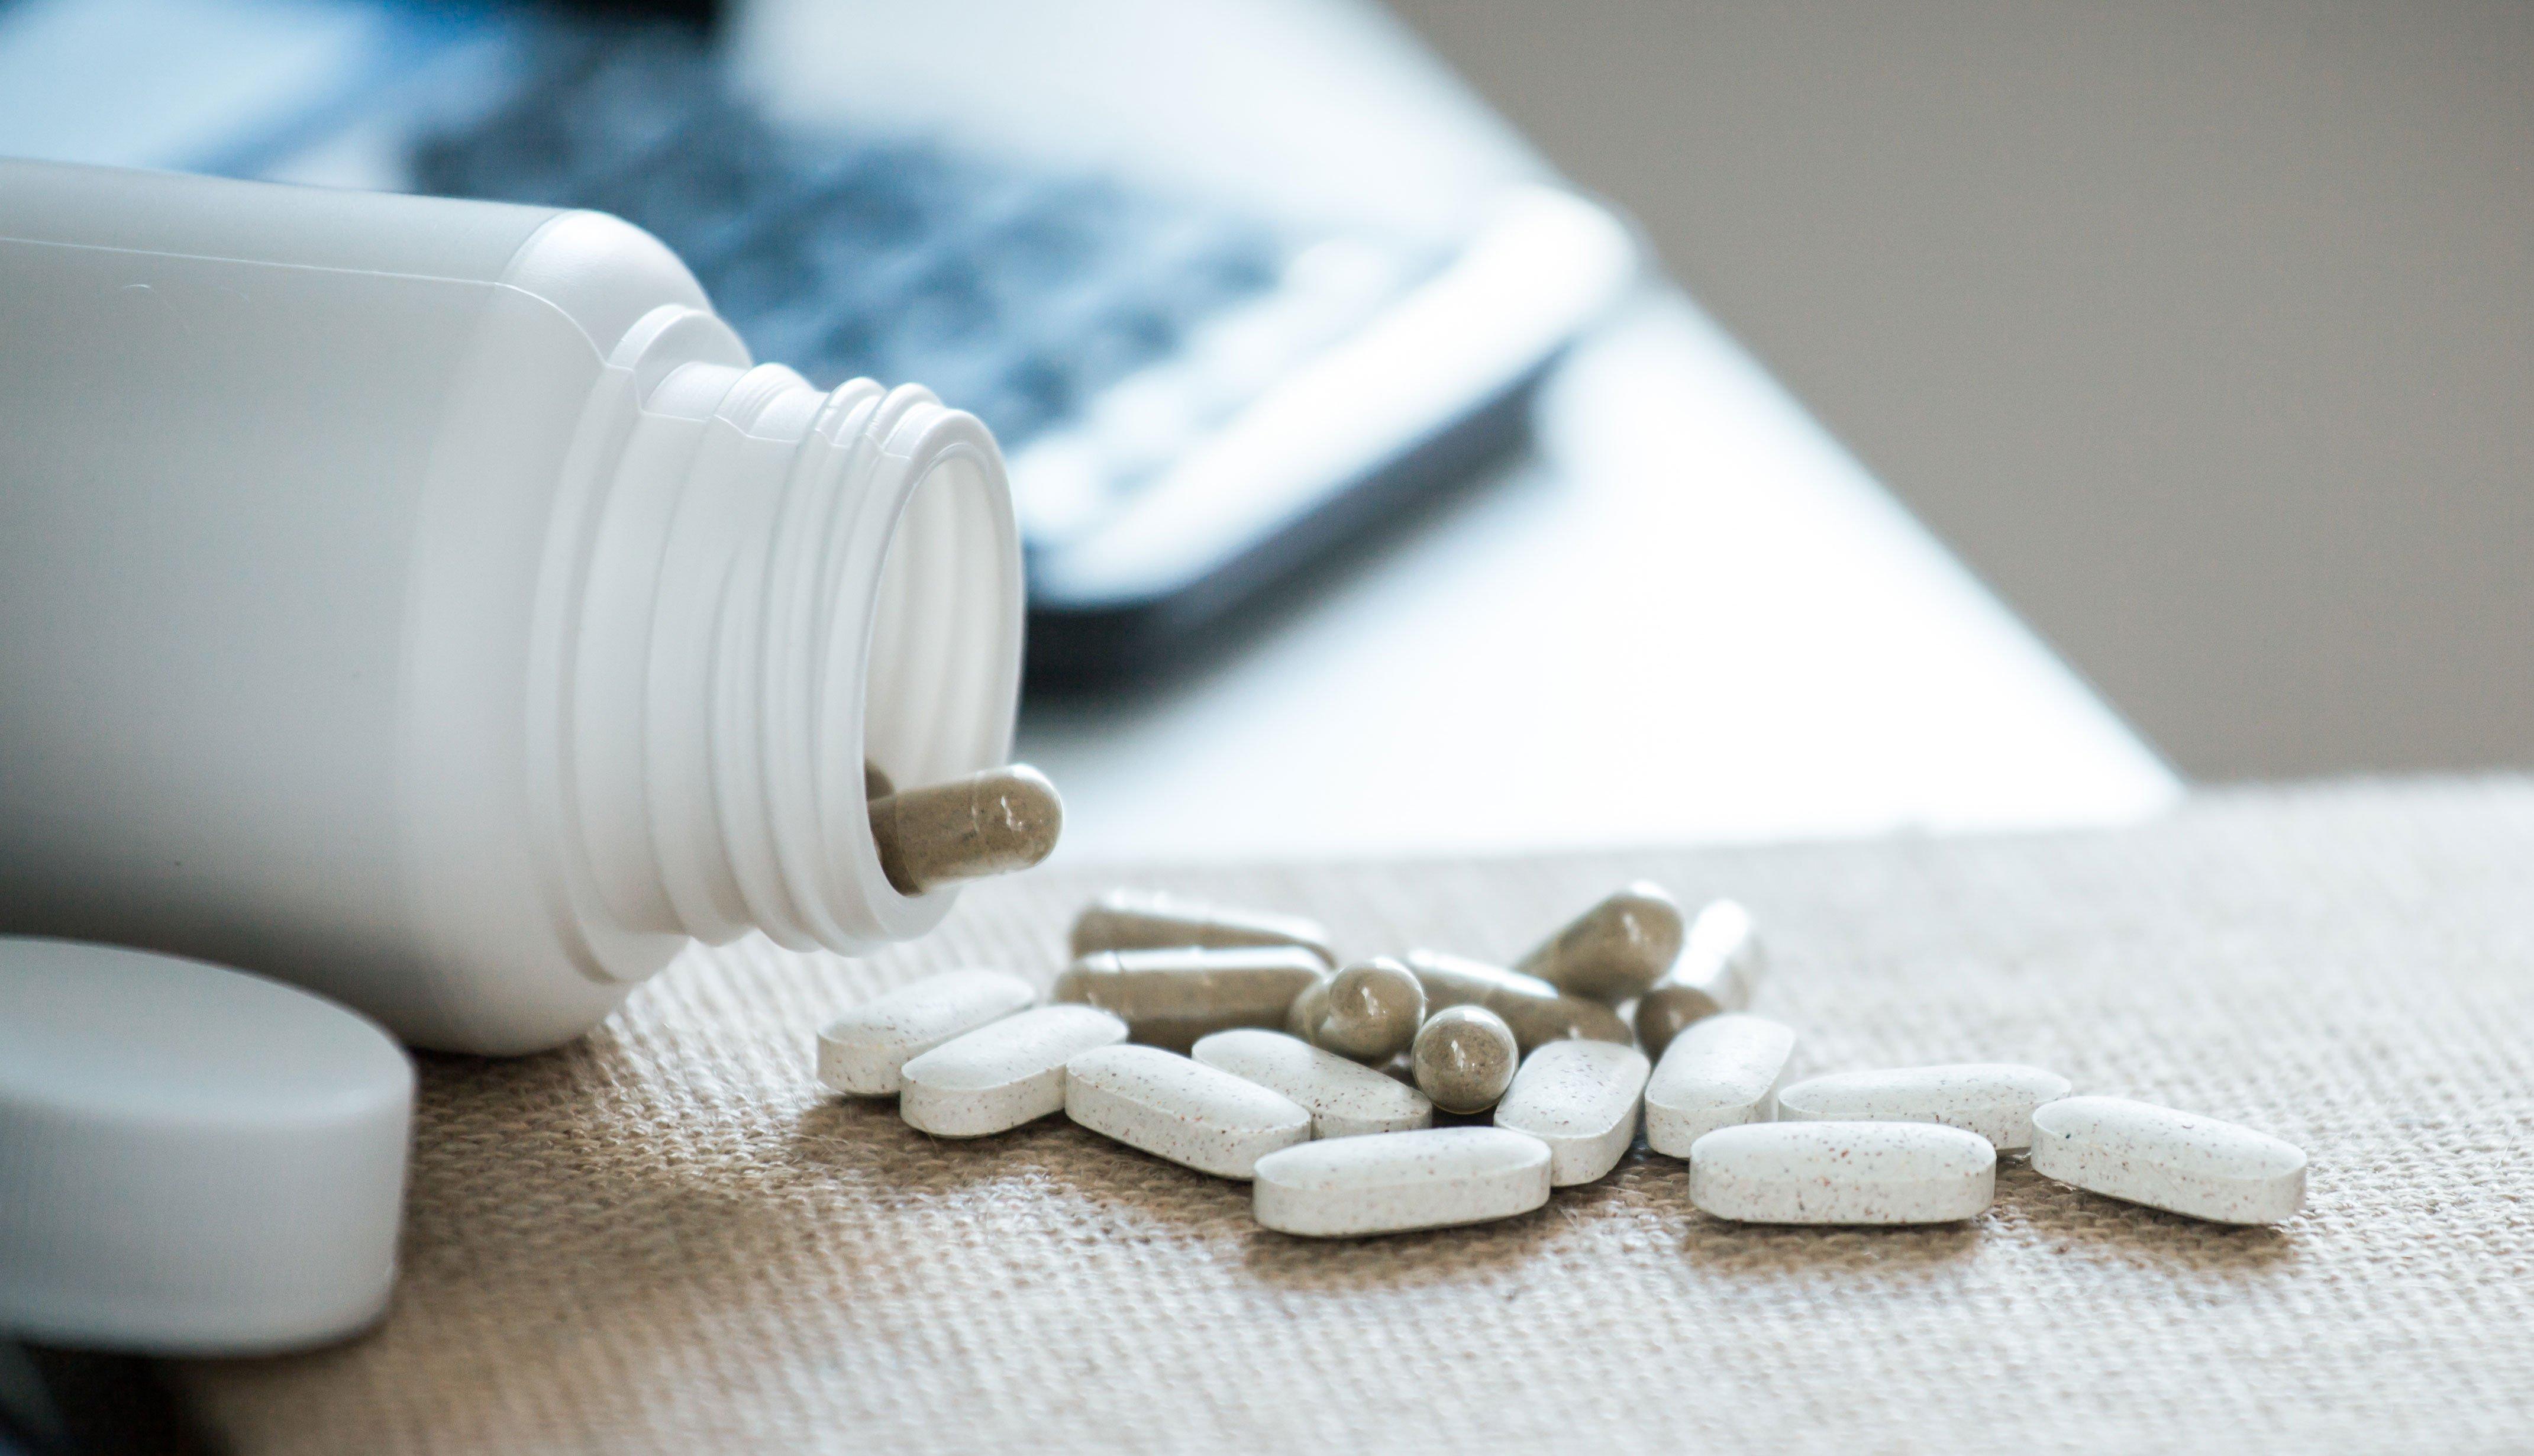 Frasco de pastillas derramado